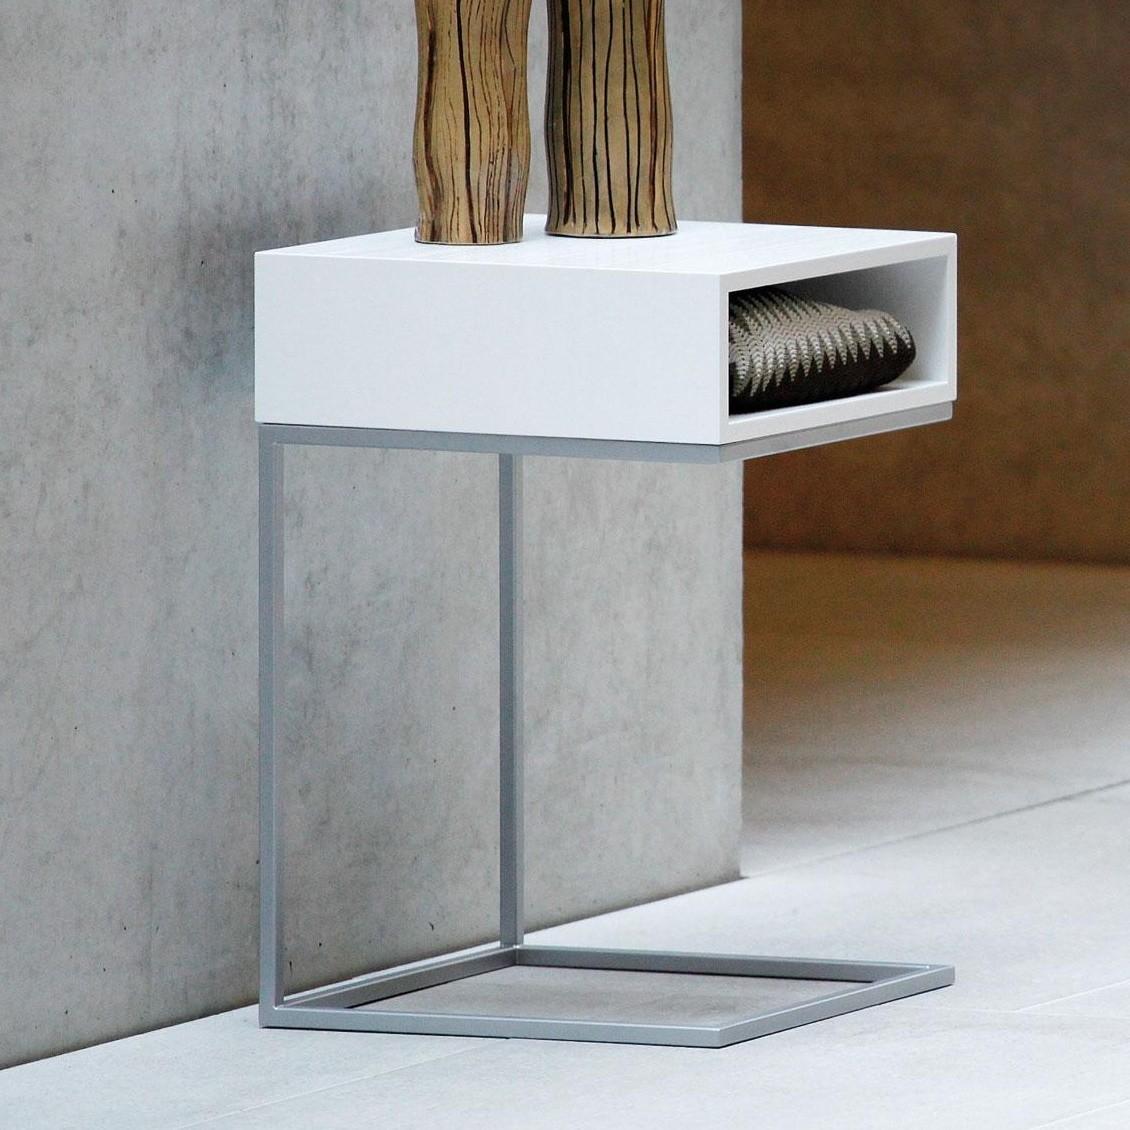 jan kurtz dina beistelltisch ambientedirect. Black Bedroom Furniture Sets. Home Design Ideas